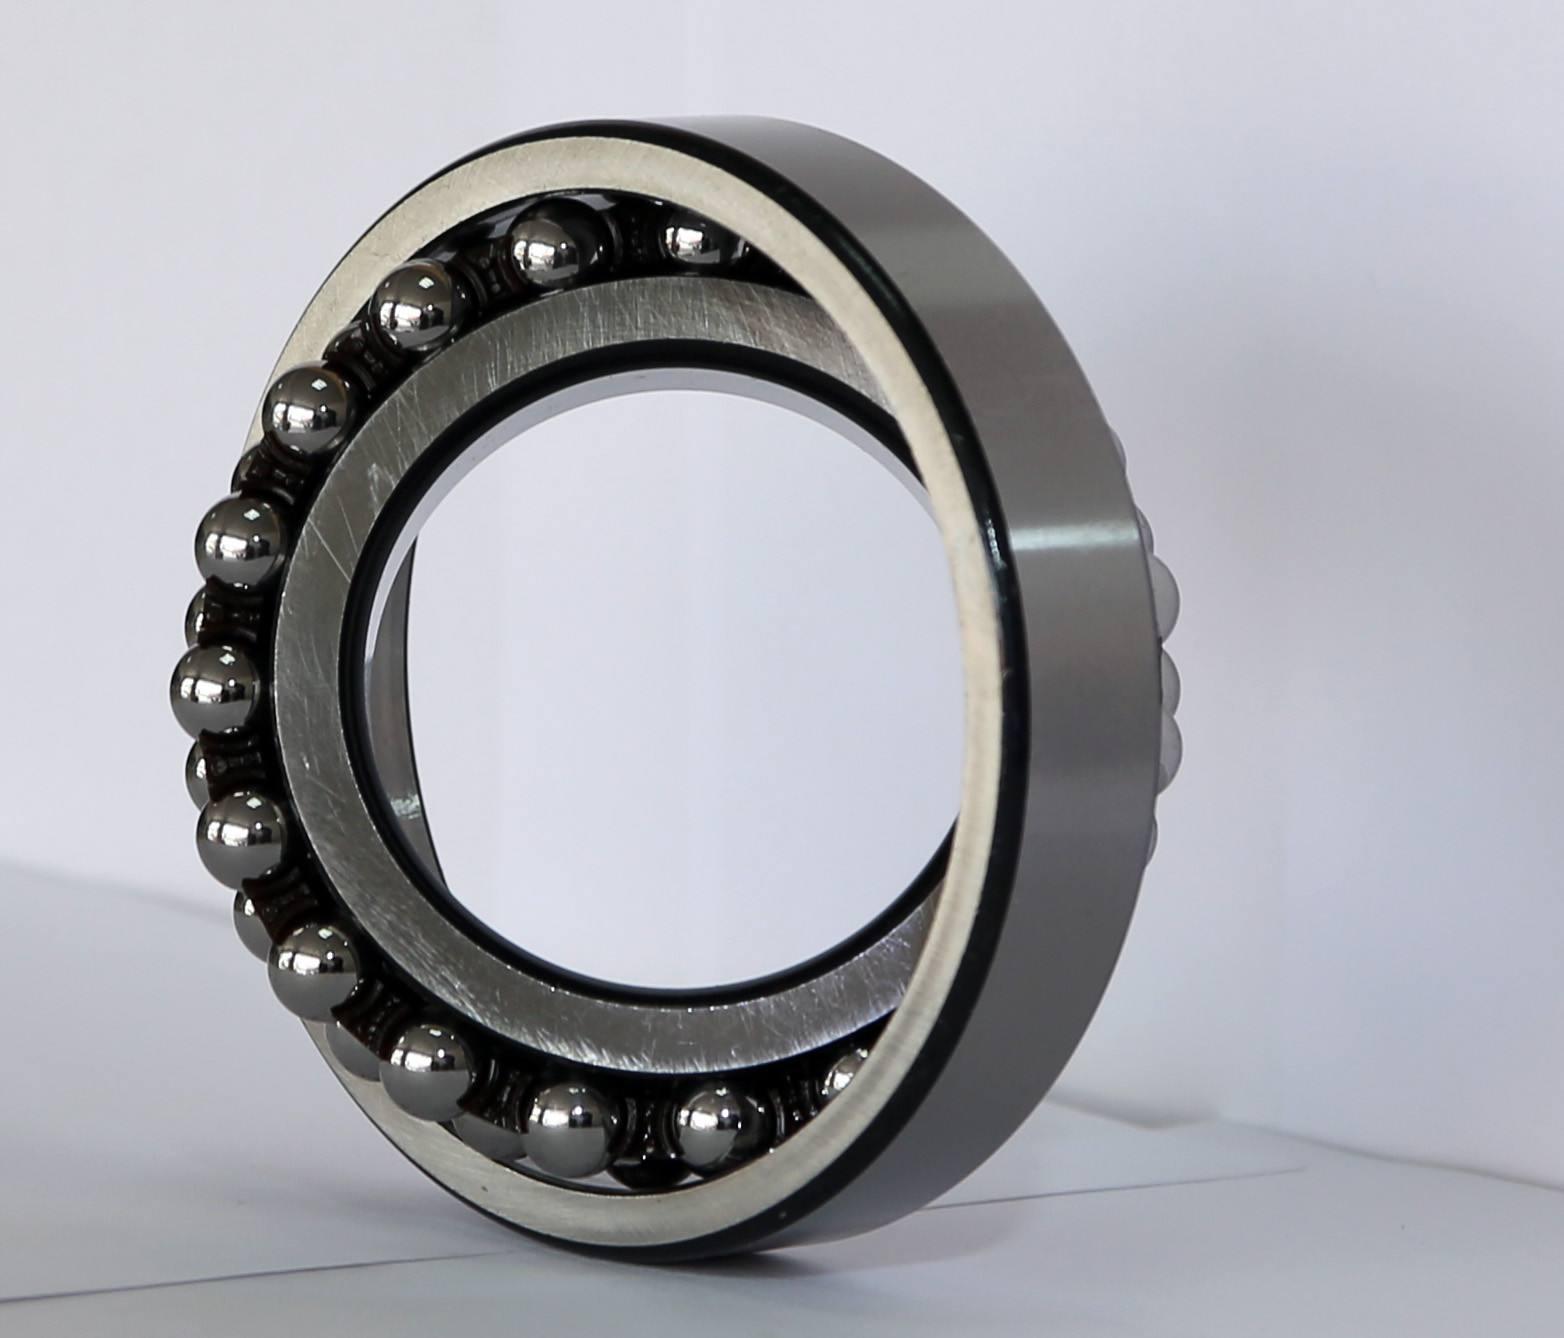 Non-standard bearing